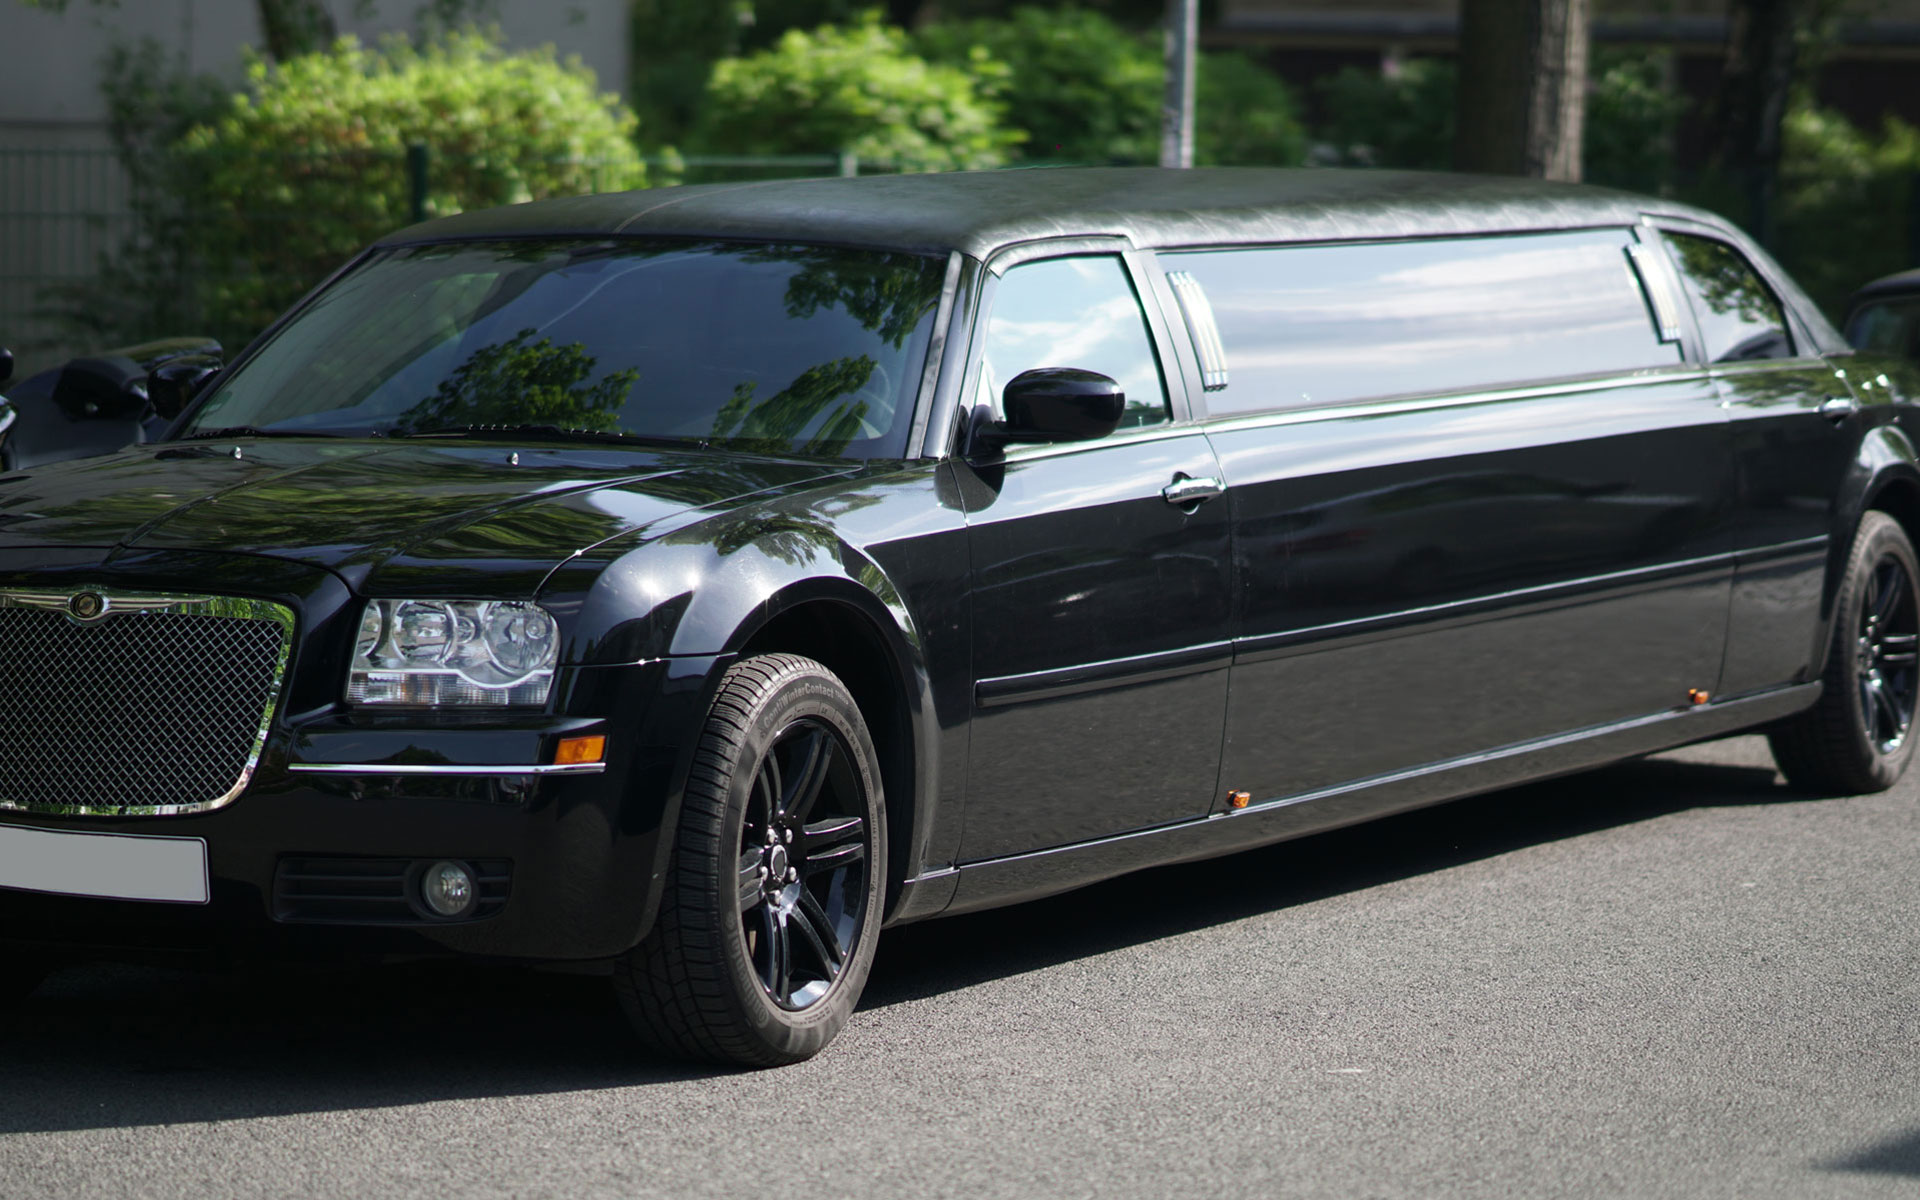 stretch limousine - stretch limo